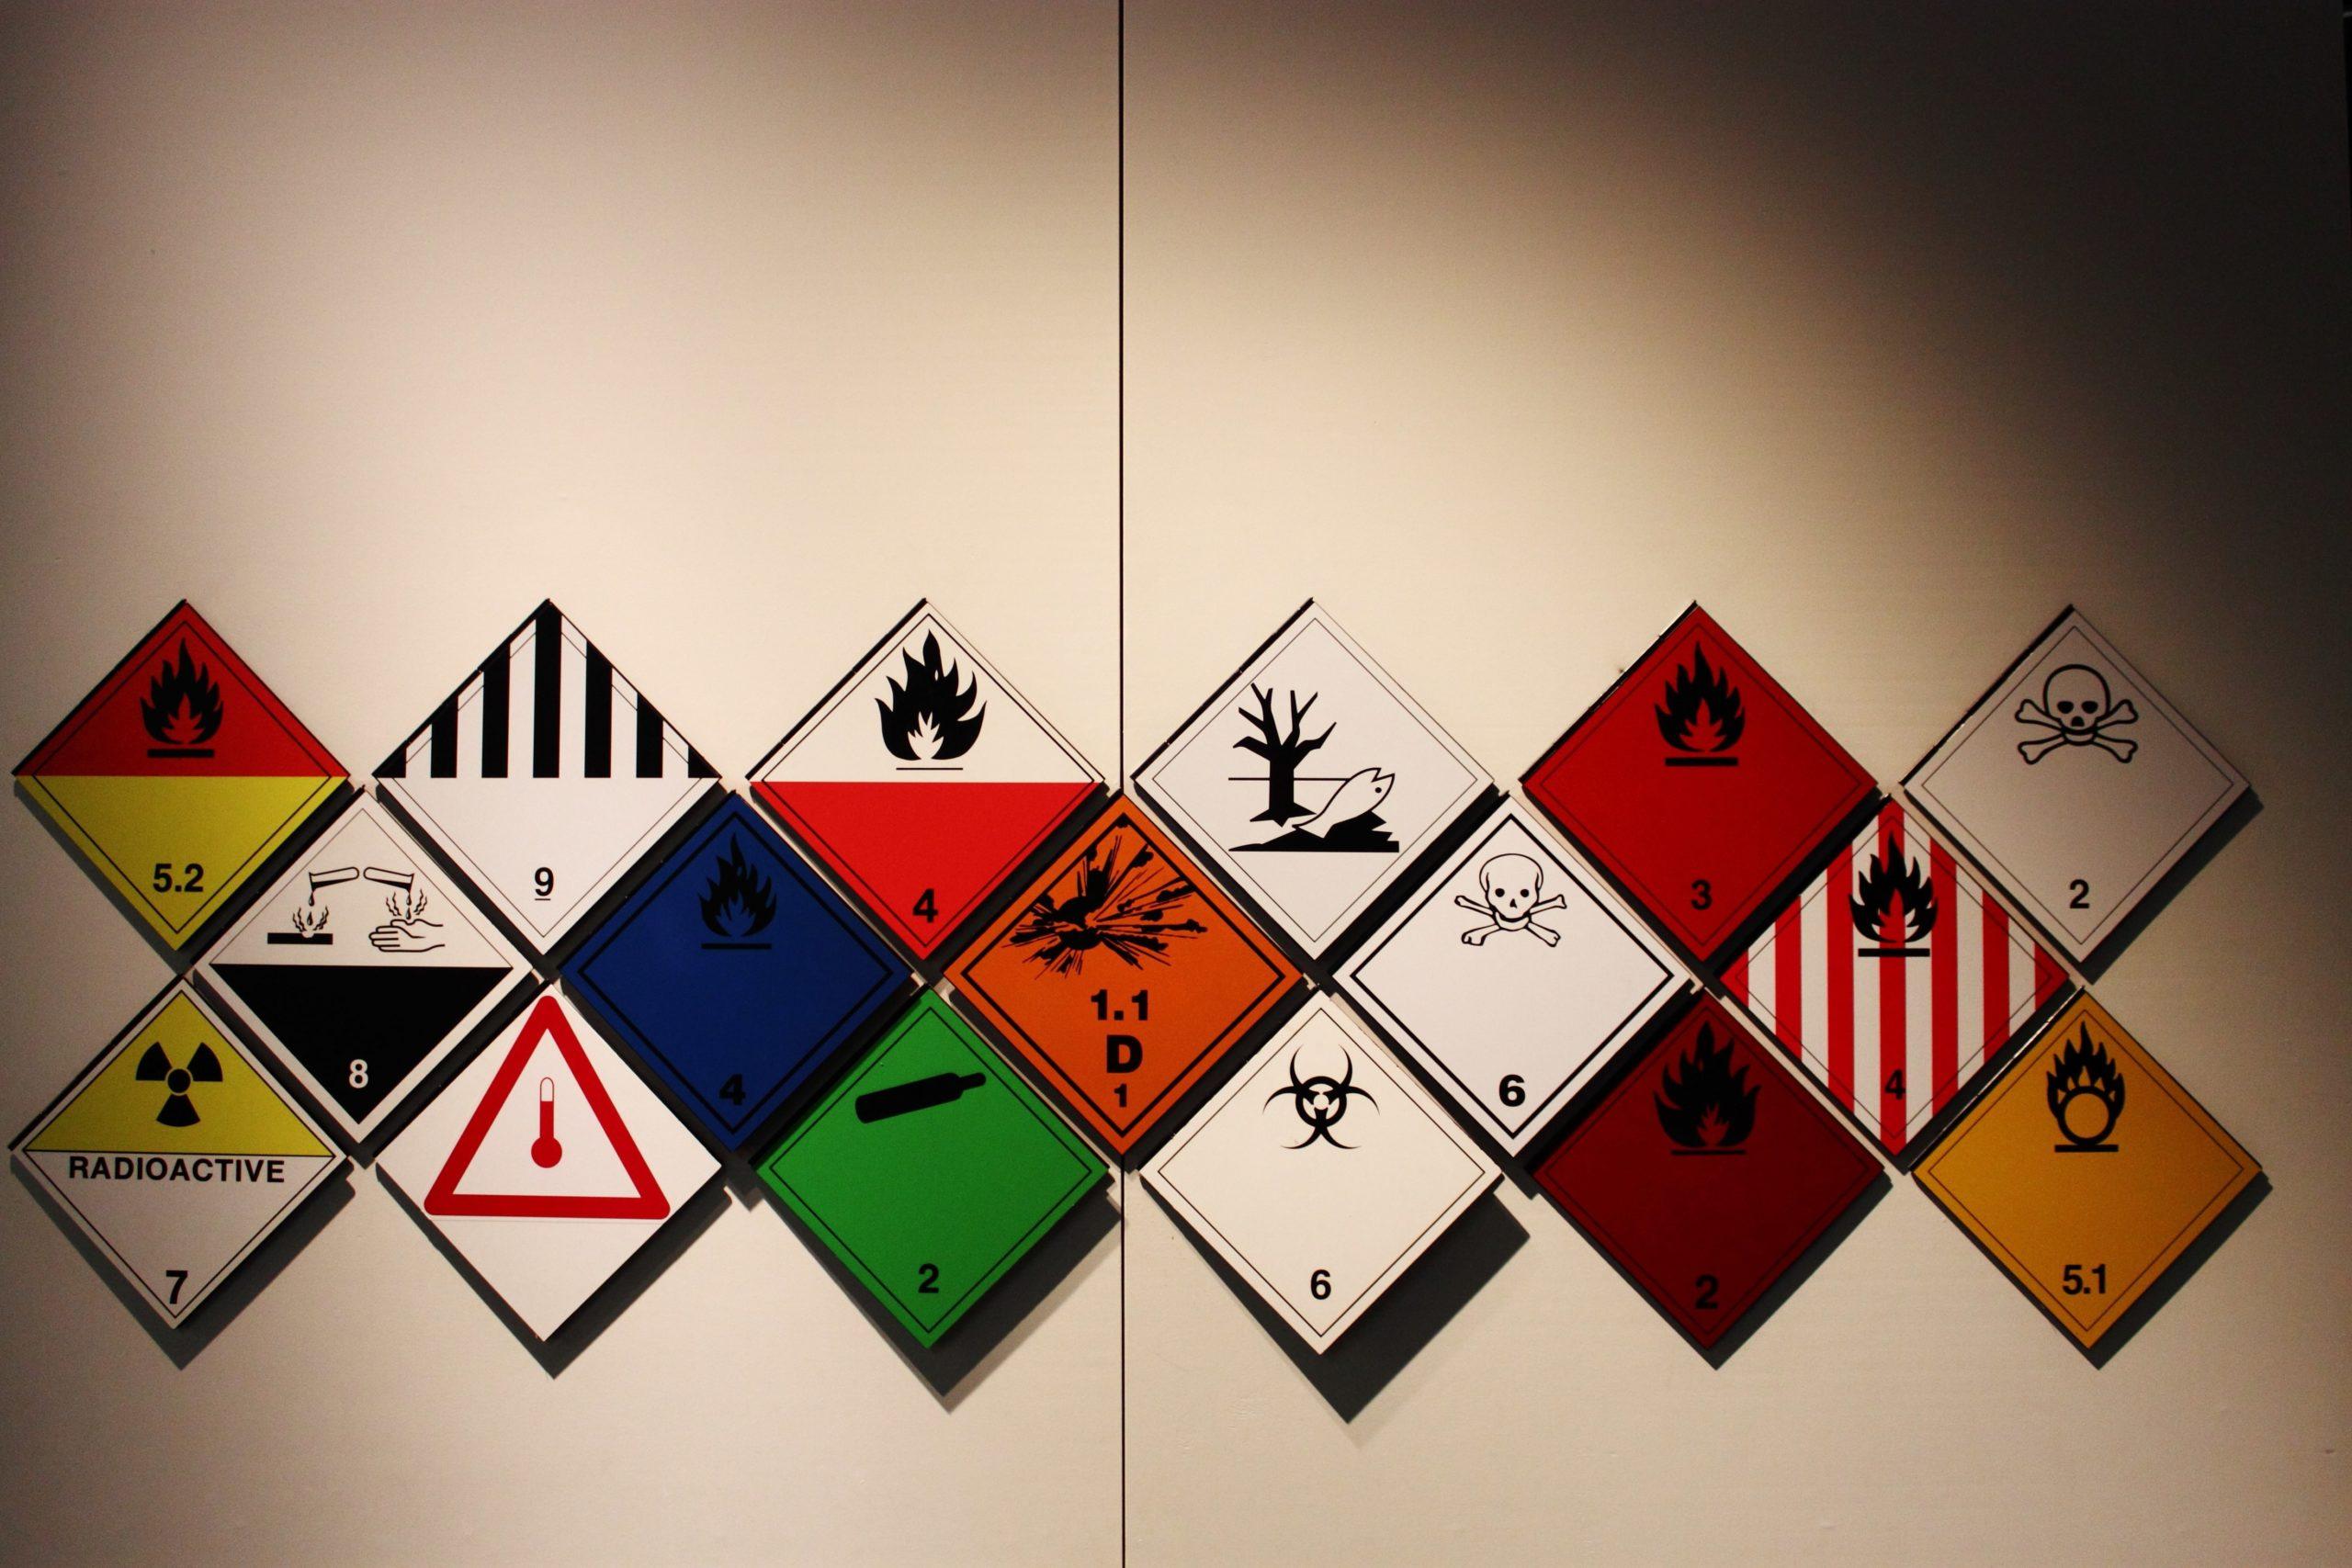 Dangerous good packing symbols